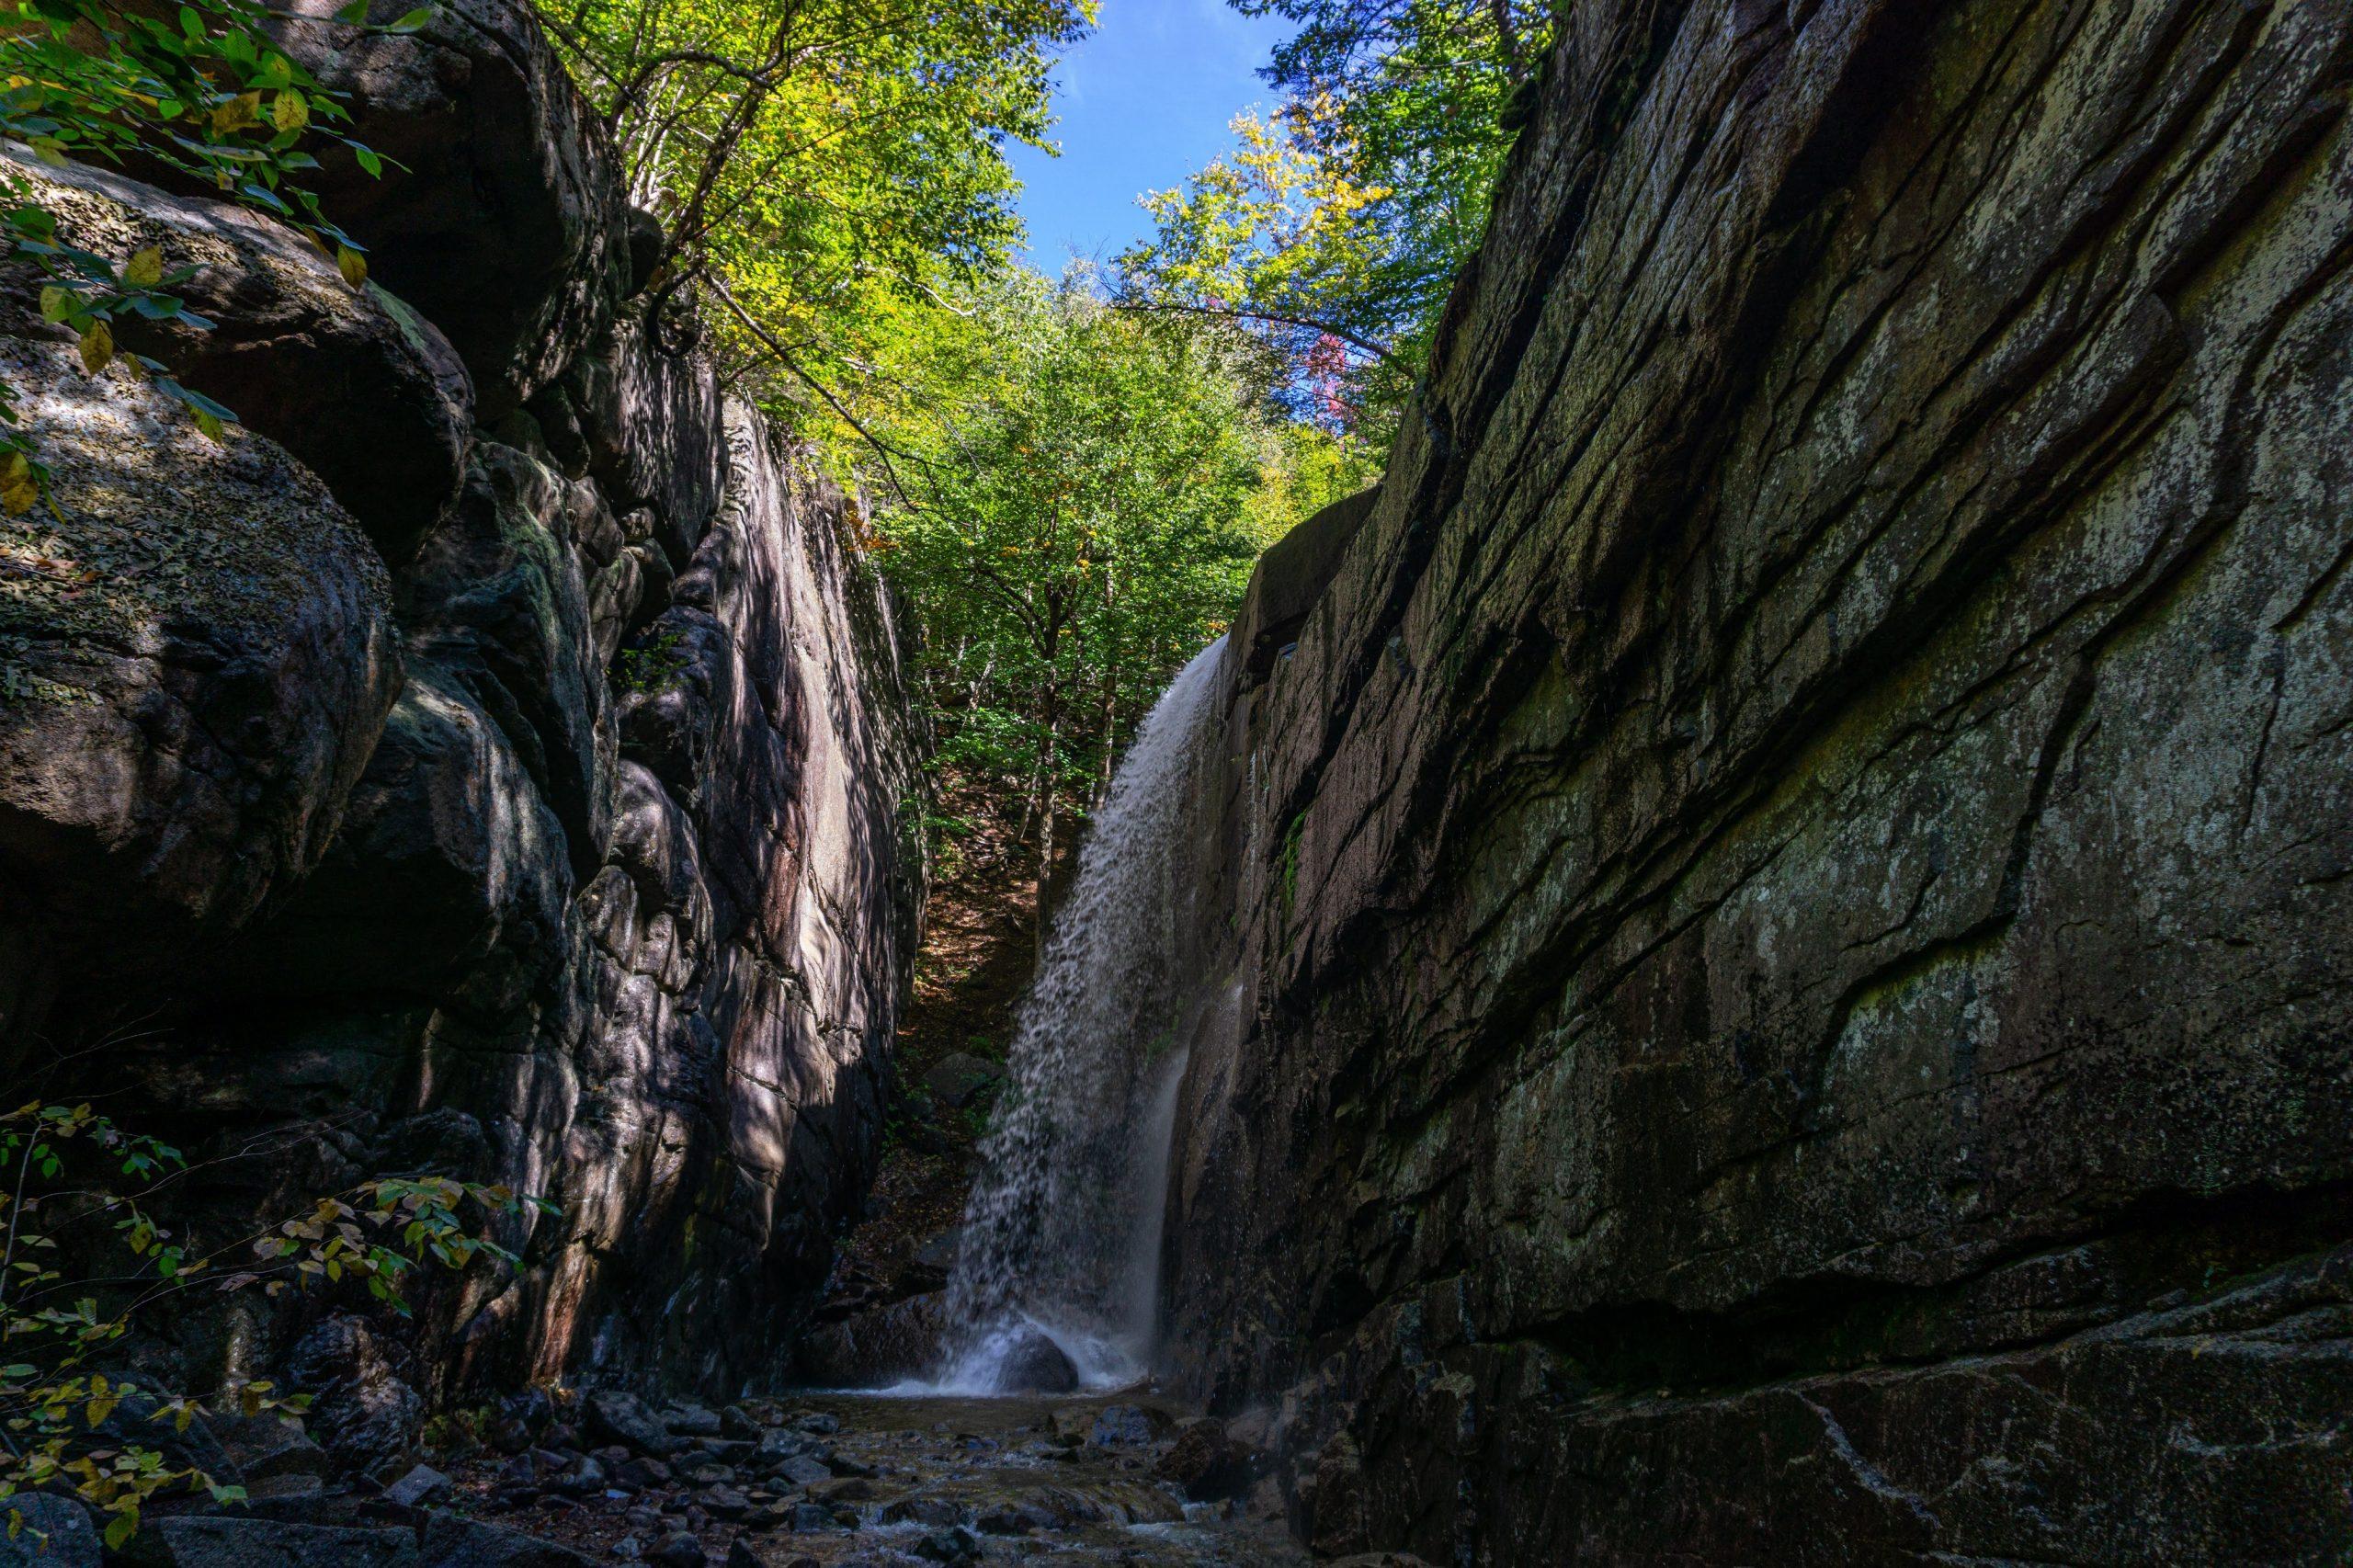 Passaconaway Champney Falls